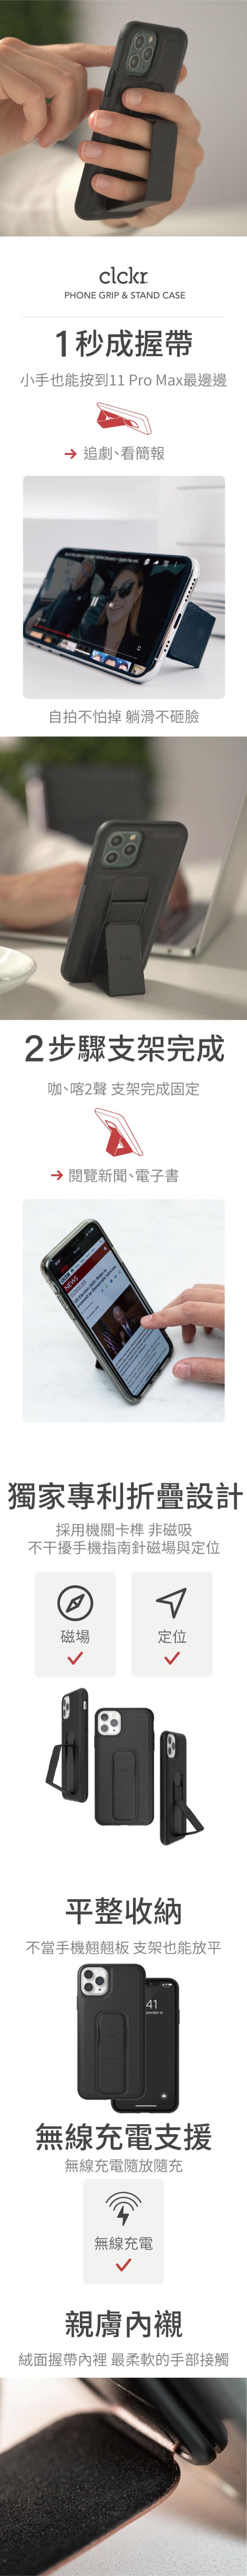 CLCKR|iPhone 11 Pro Max 手機殼 全黑支架款